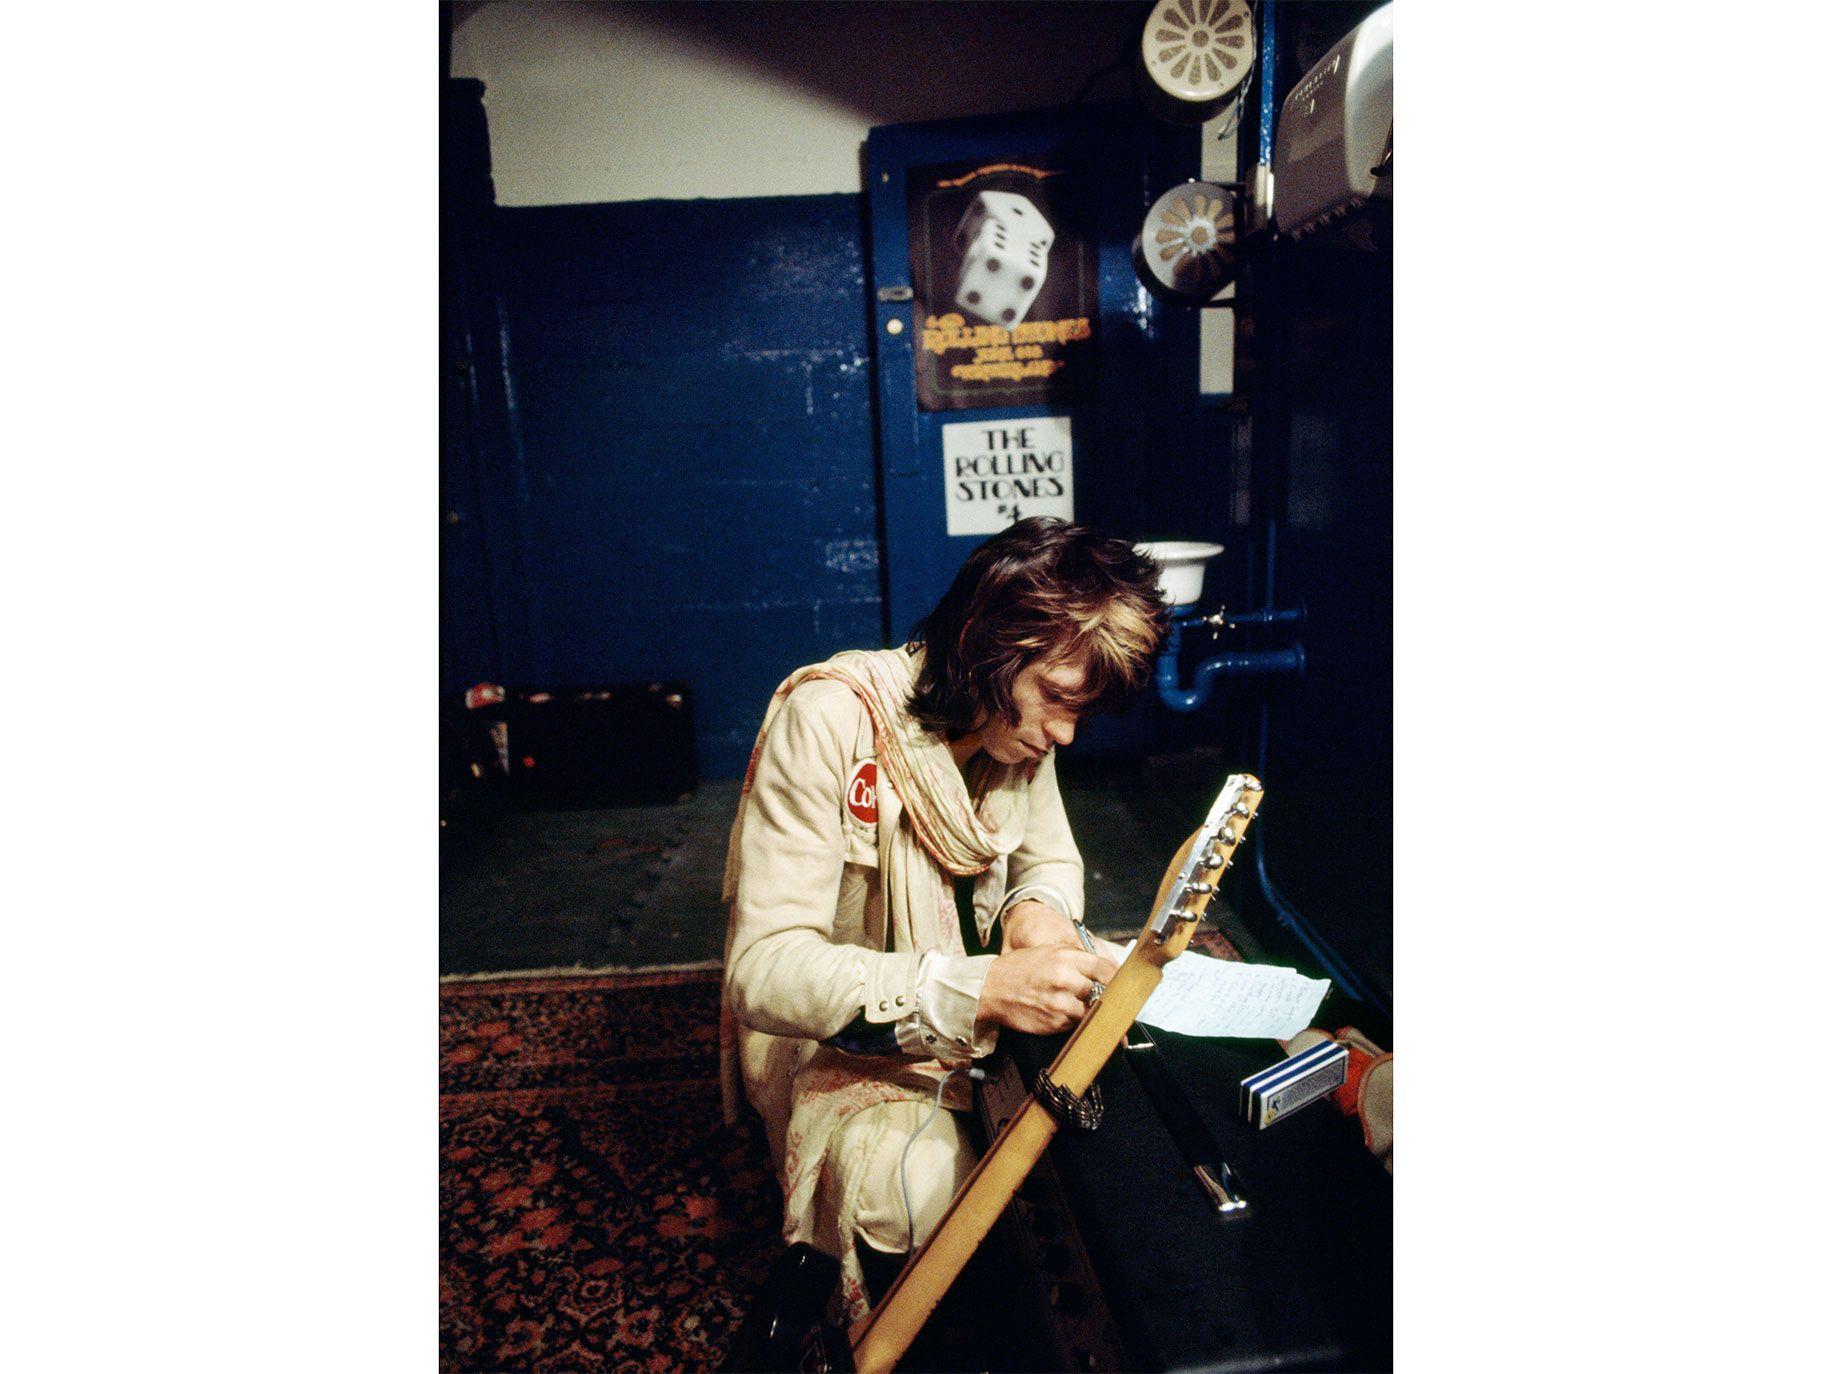 Keith Richards backstage at Winterland, San Francisco, 1972.